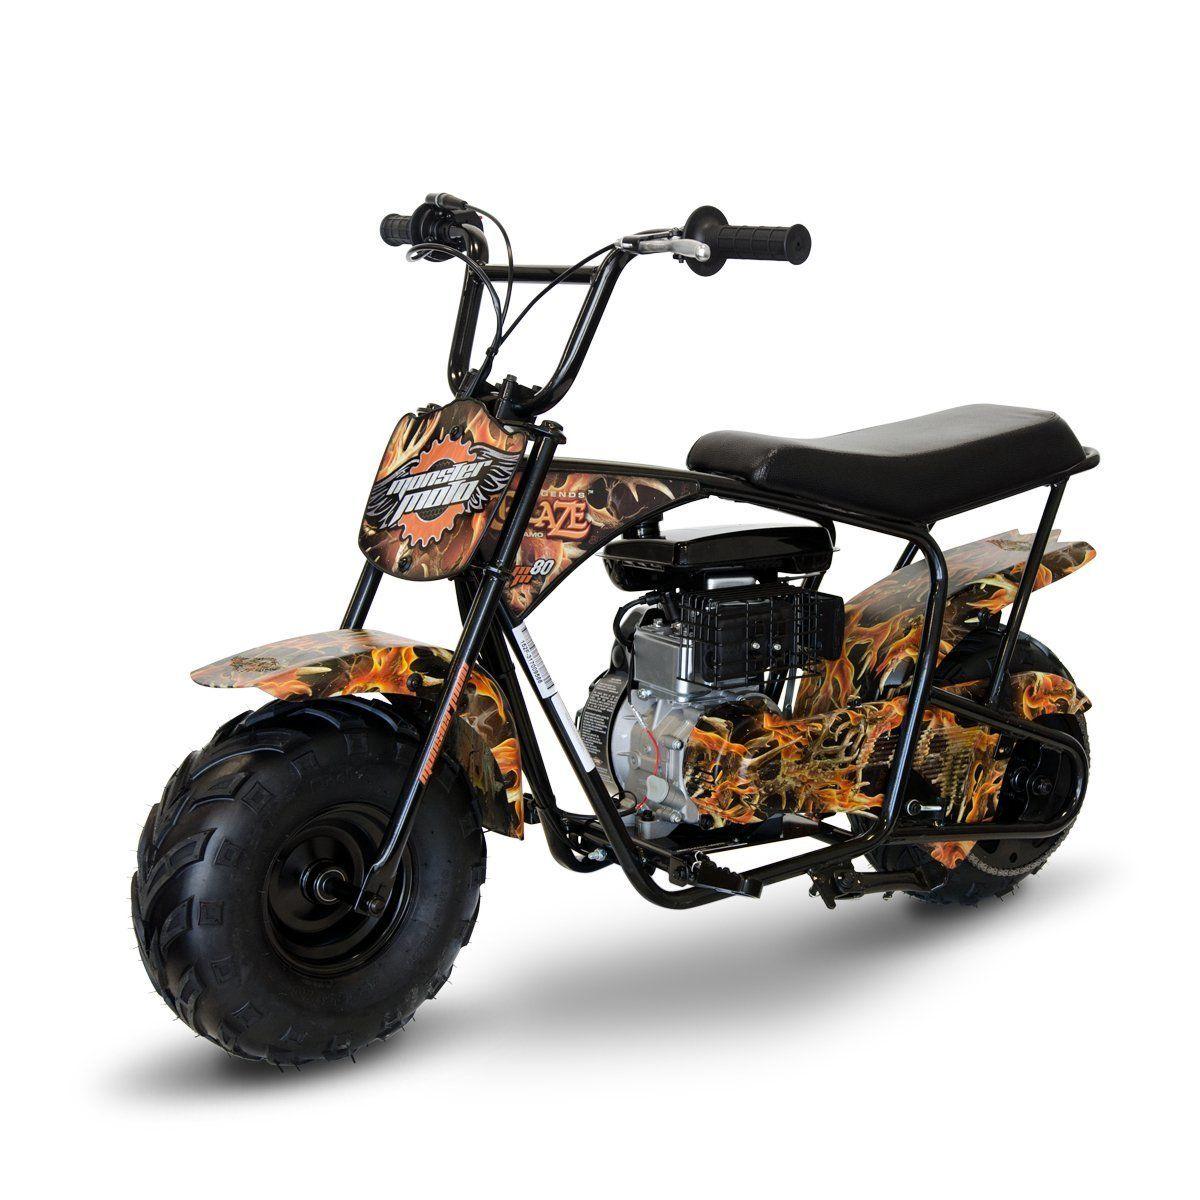 Monster Moto Legends Blaze 80cc Gas Mini Bike Mini Bike Dirt